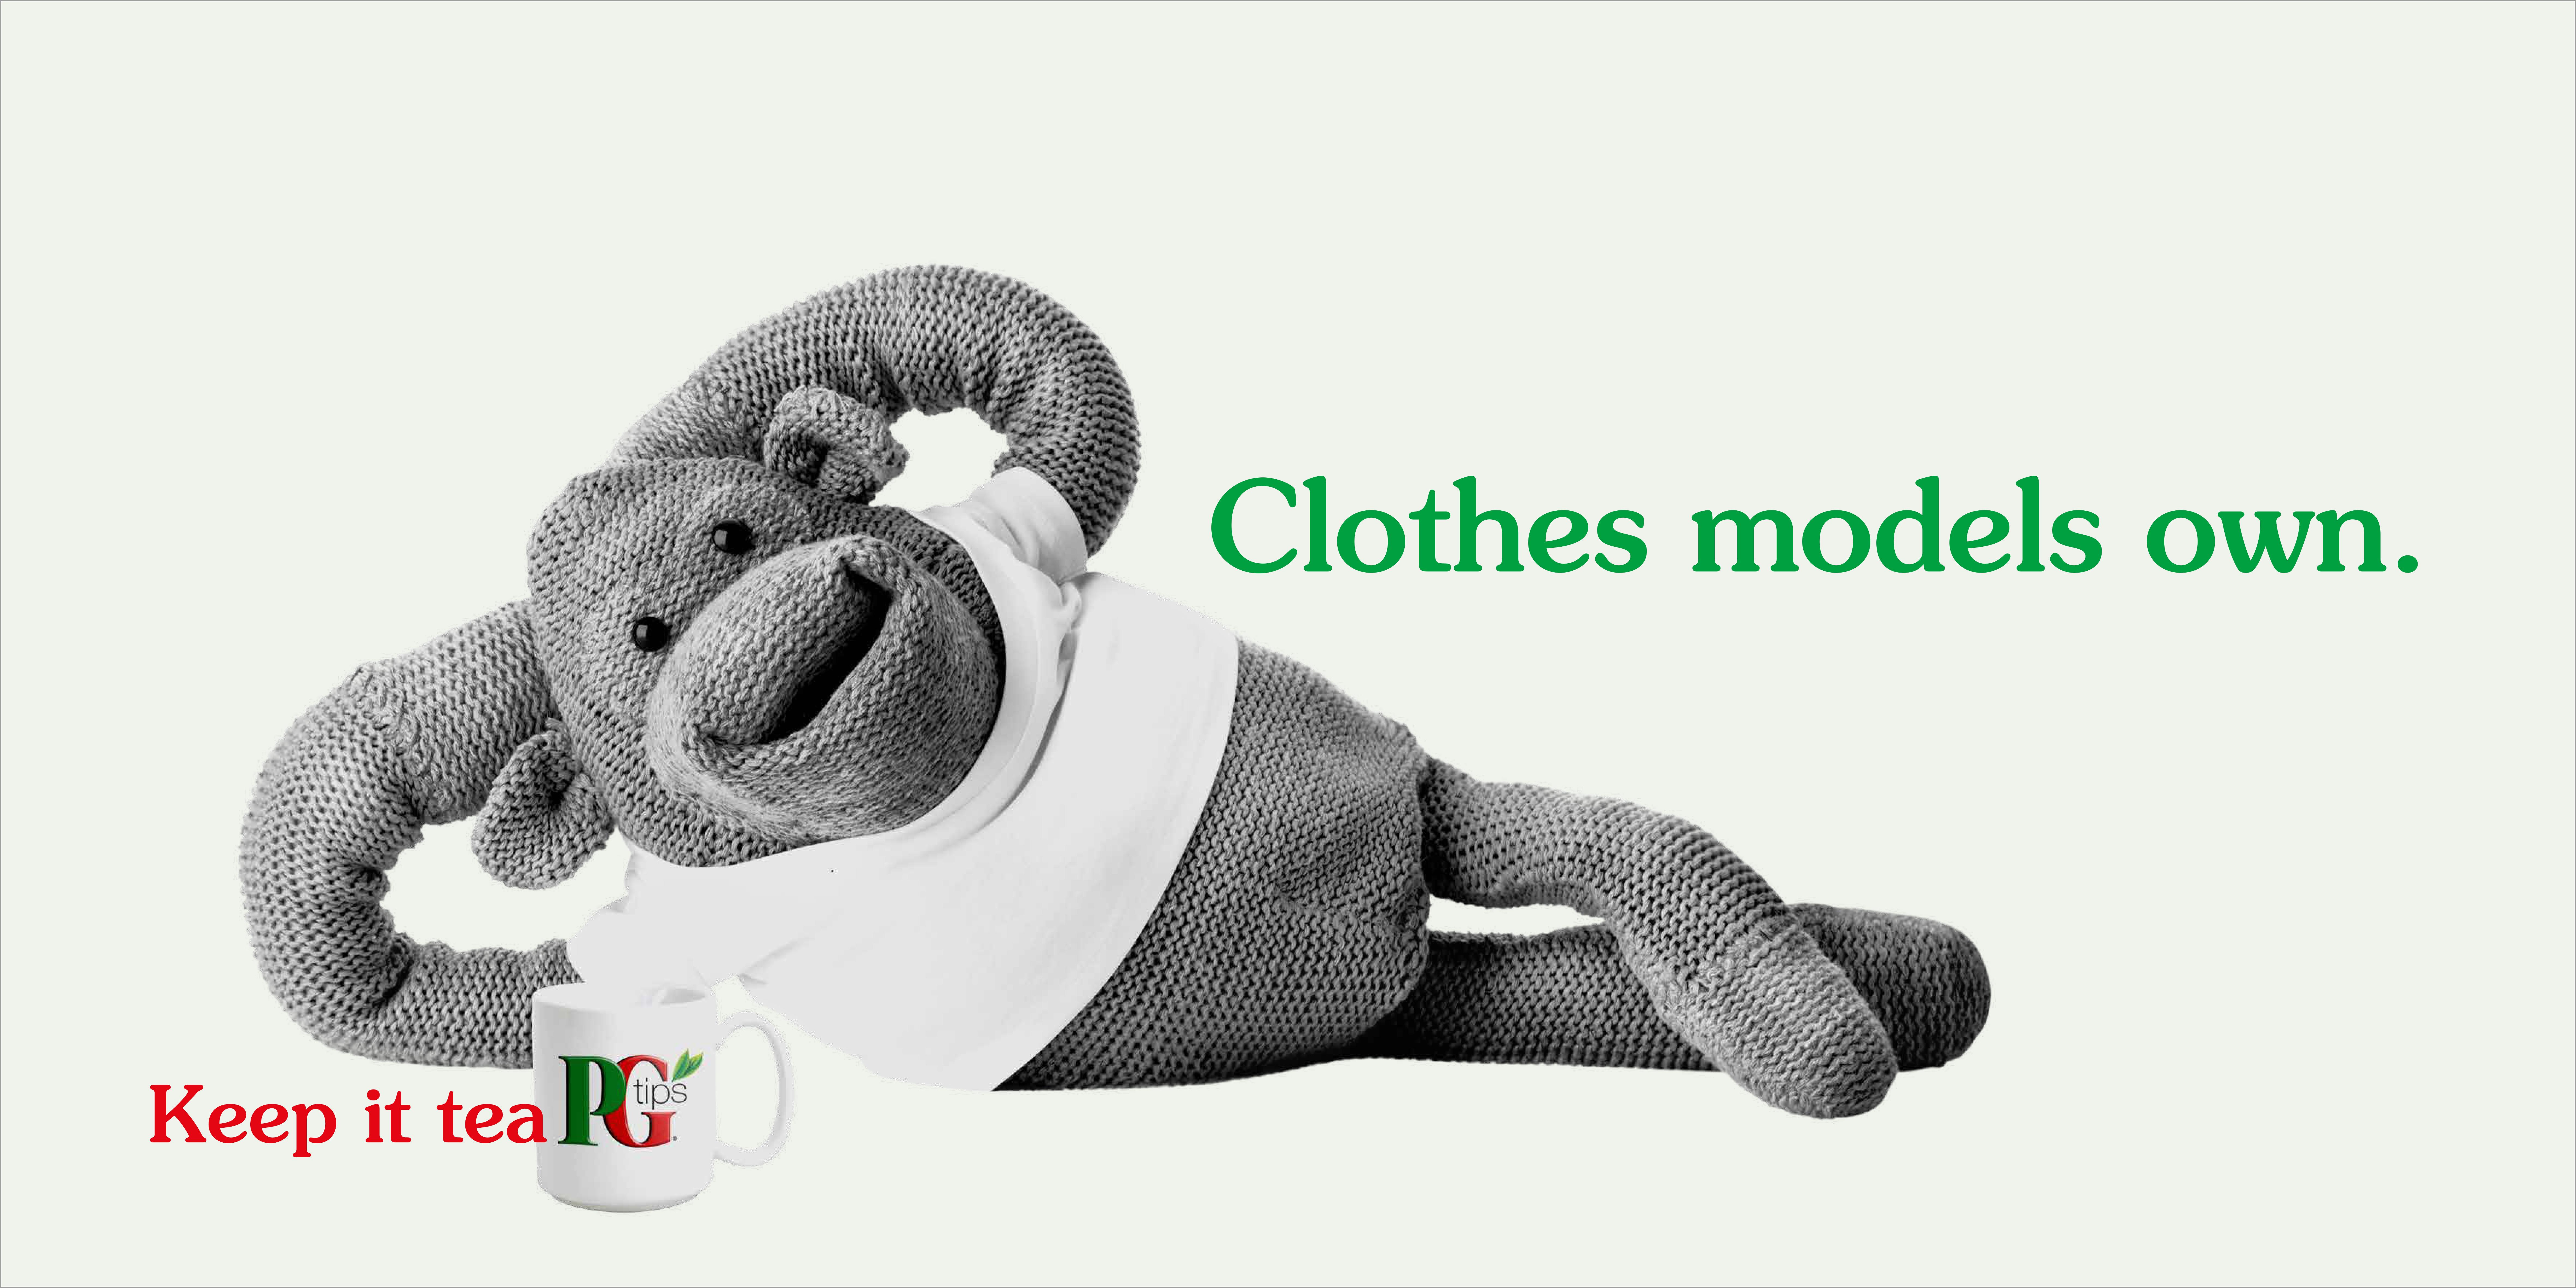 PG tips 'Clothes' rough